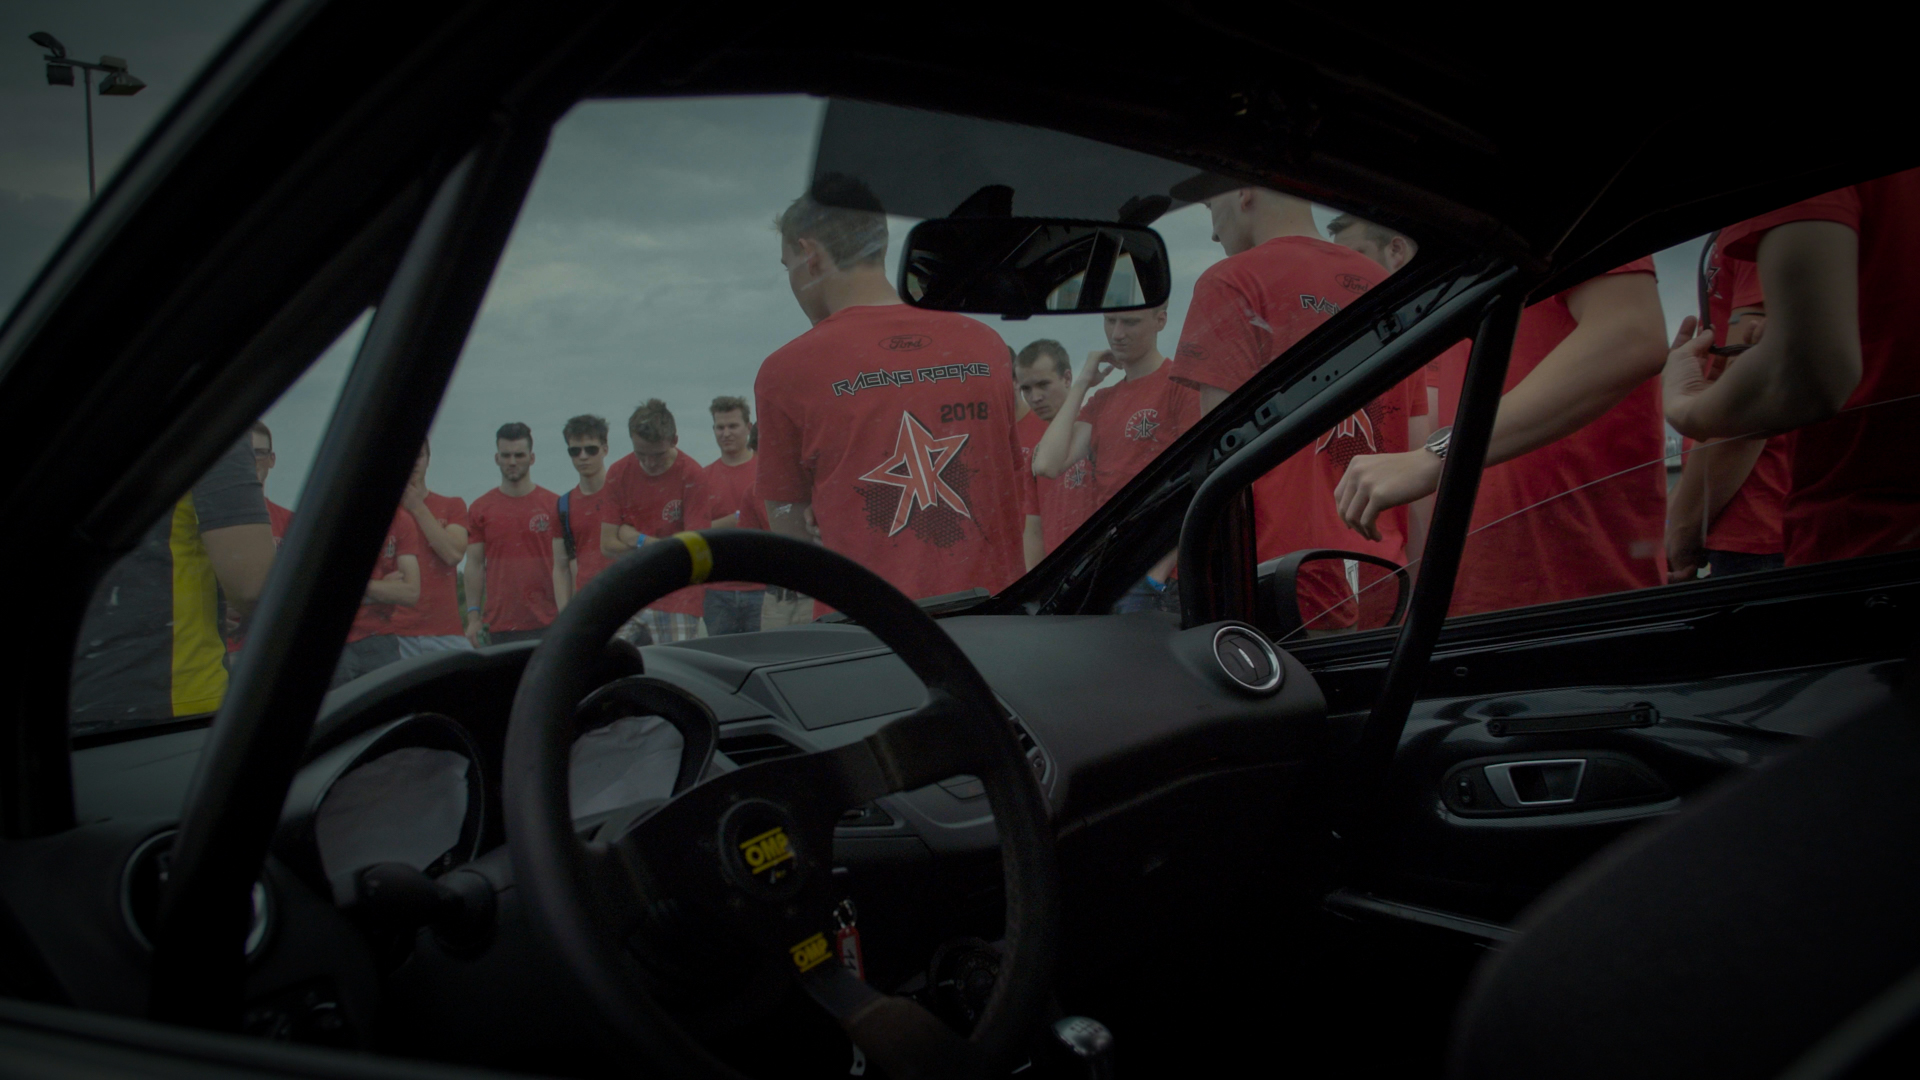 RacingRookie_2018_Vorausscheidung03_Melk_Screenshot_AUTrenalinMEDIA-01-2.jpg